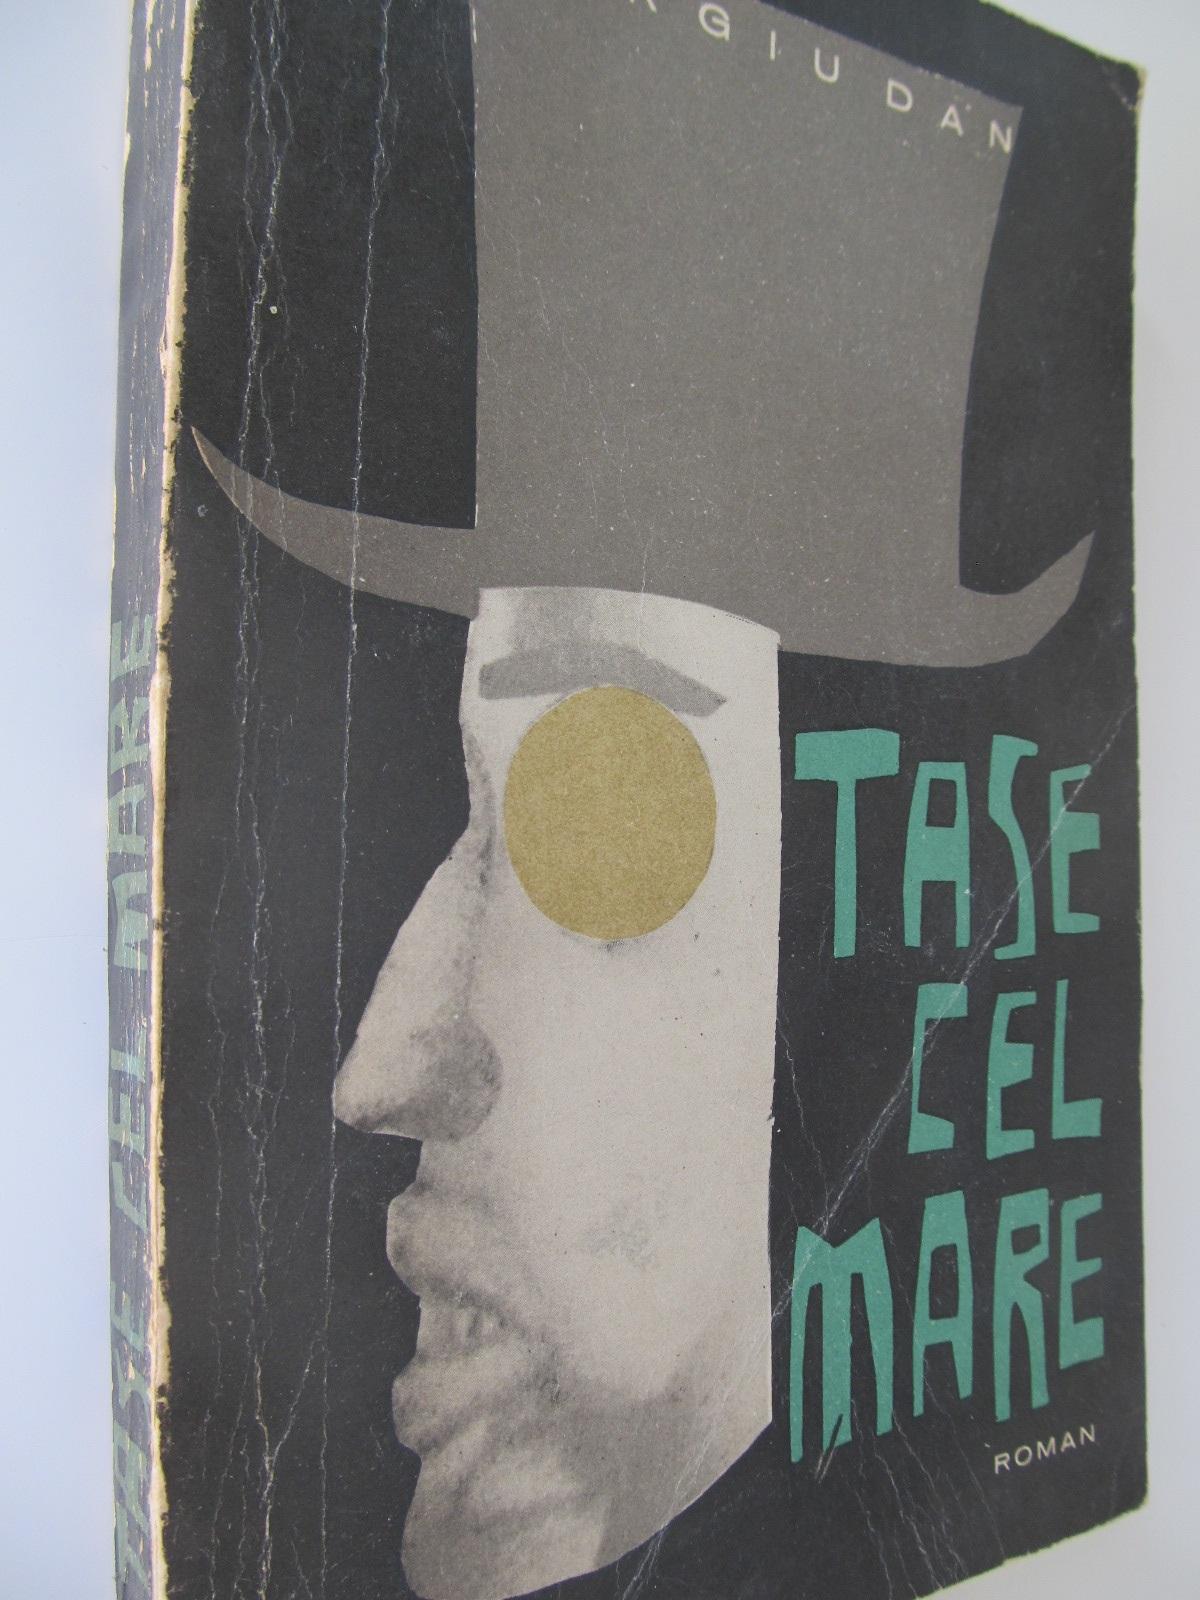 Tase cel mare - Sergiu Dan | Detalii carte